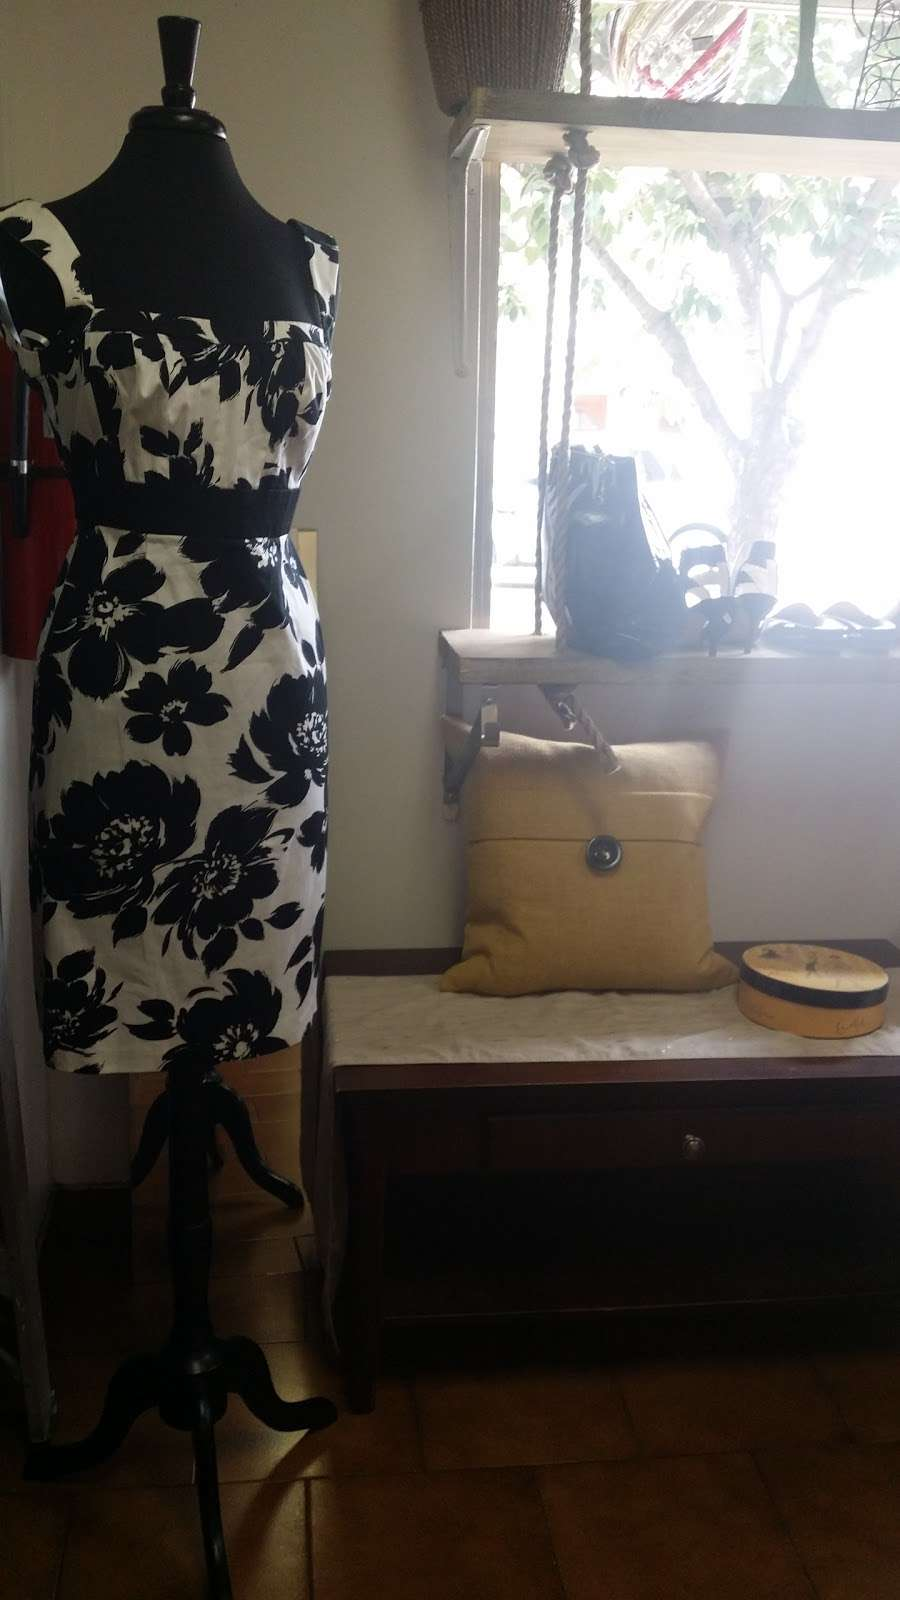 Glow Thrift Shop Store - clothing store  | Photo 8 of 10 | Address: 561 Palisade Ave, Jersey City, NJ 07307, USA | Phone: (646) 399-7397